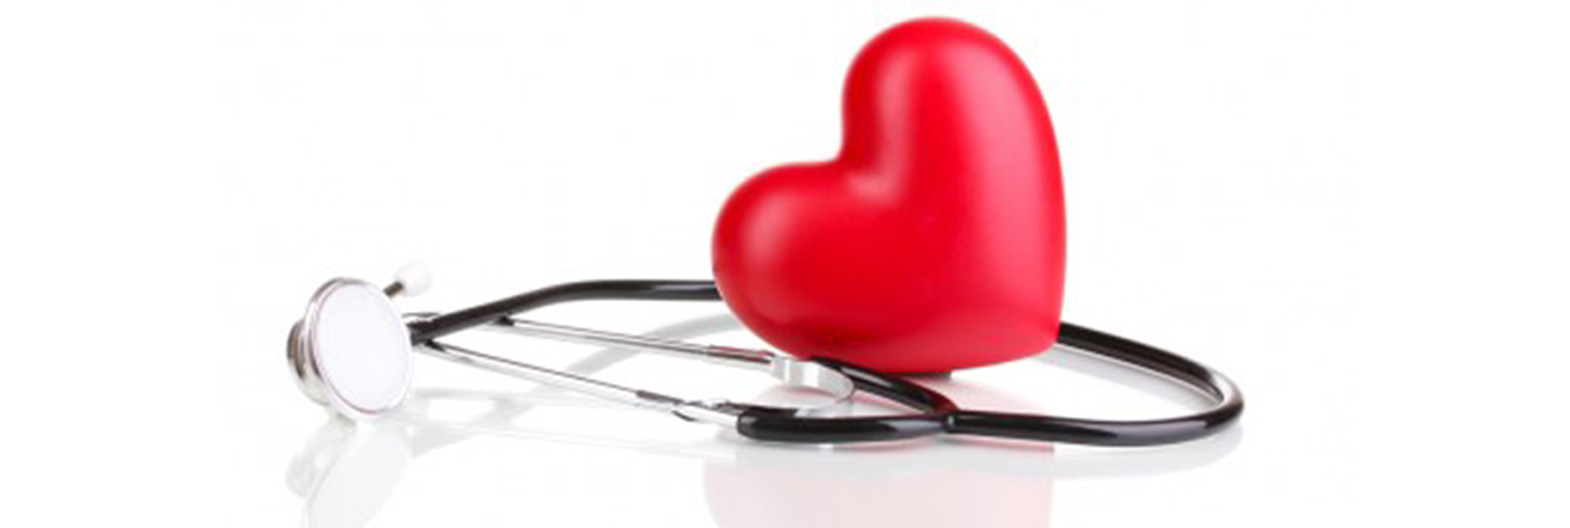 hipertenzija yra hipertenzija)